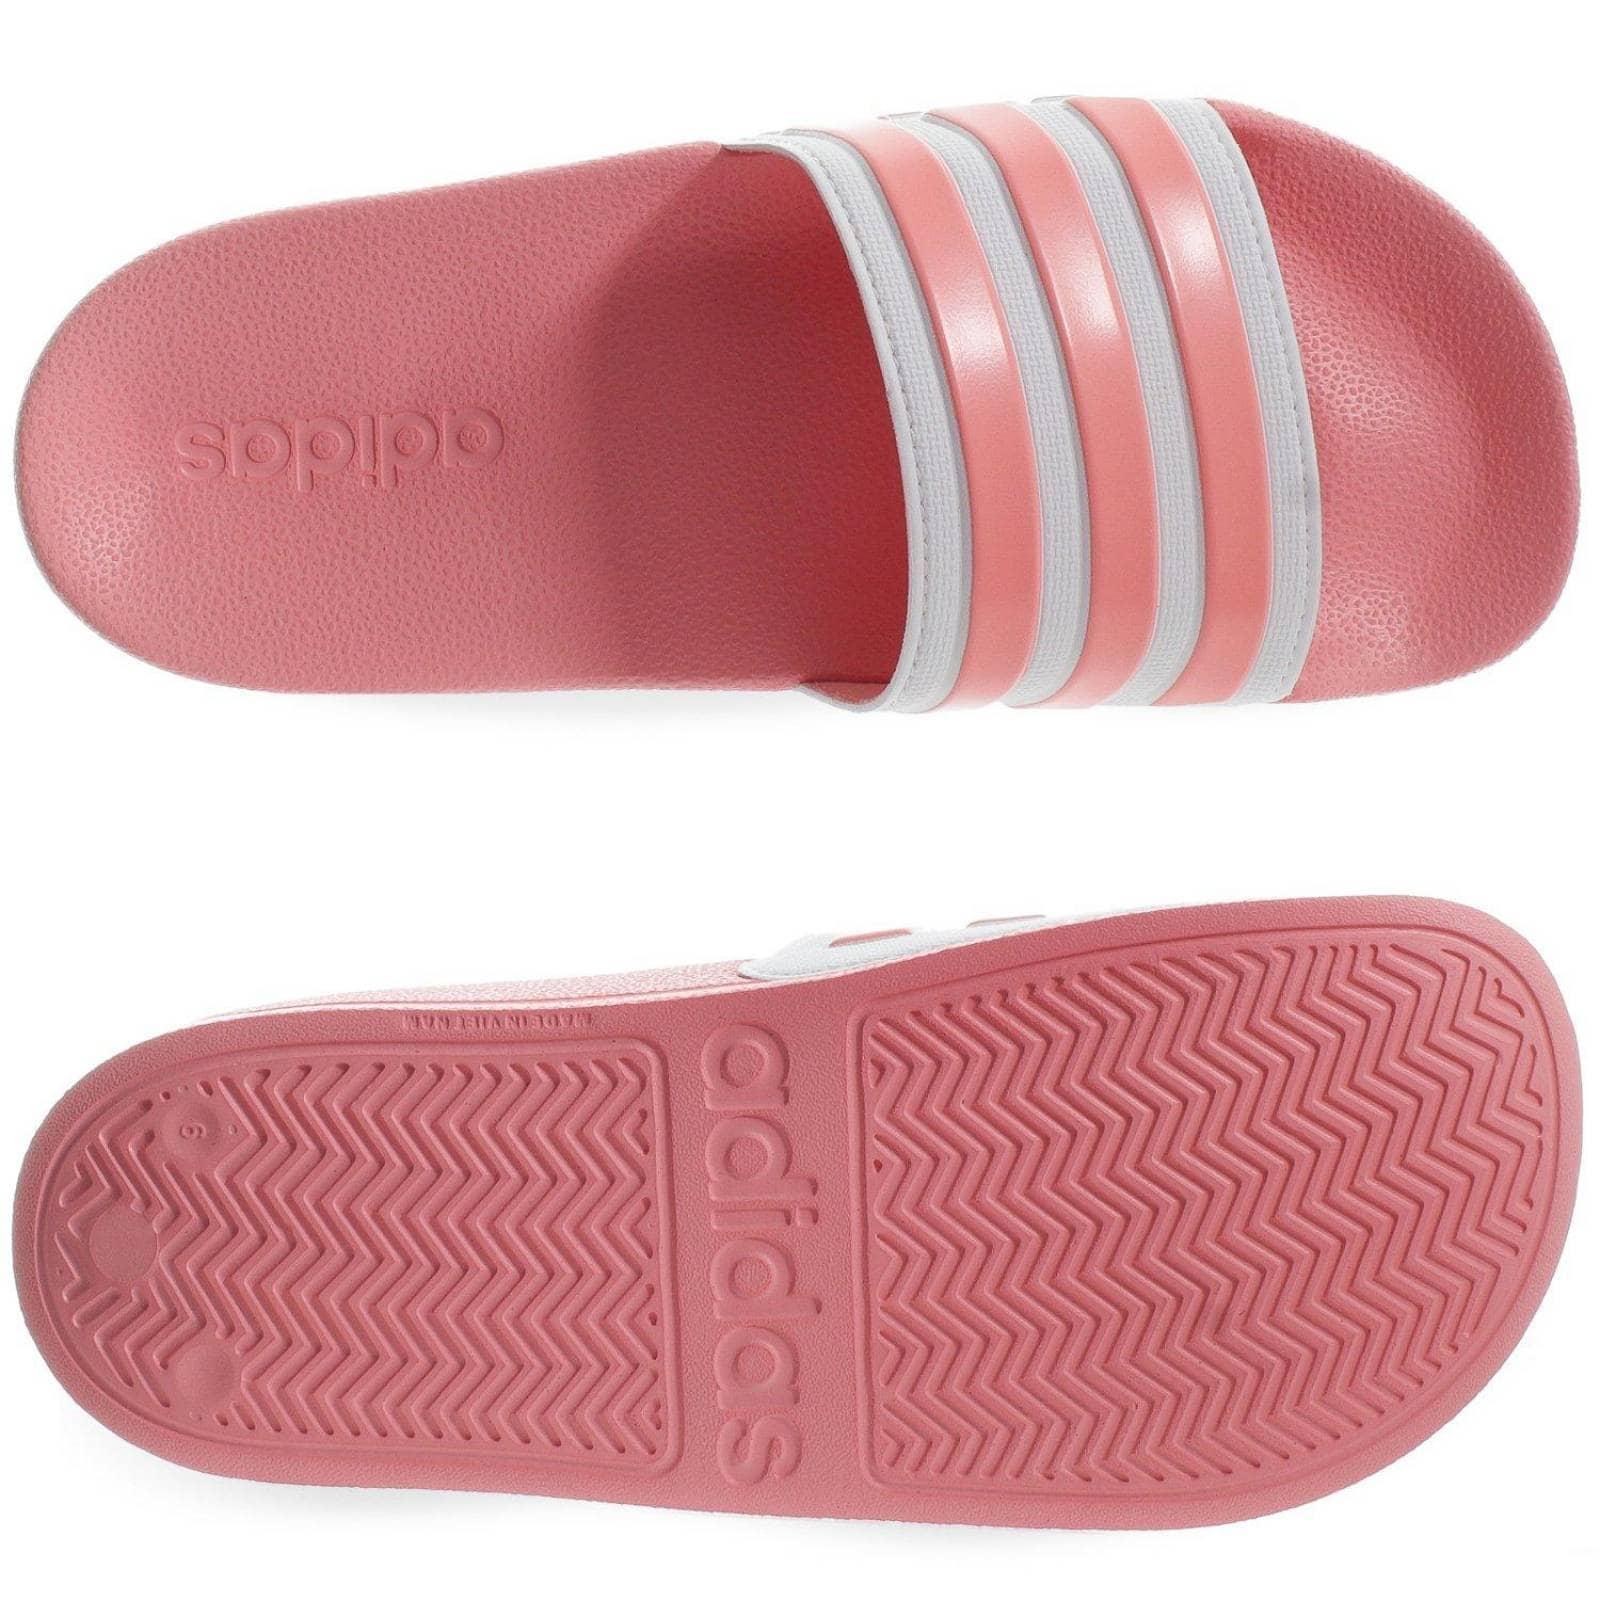 Sandalias Adidas Adilette Shower EG1886 Rosa Mujer